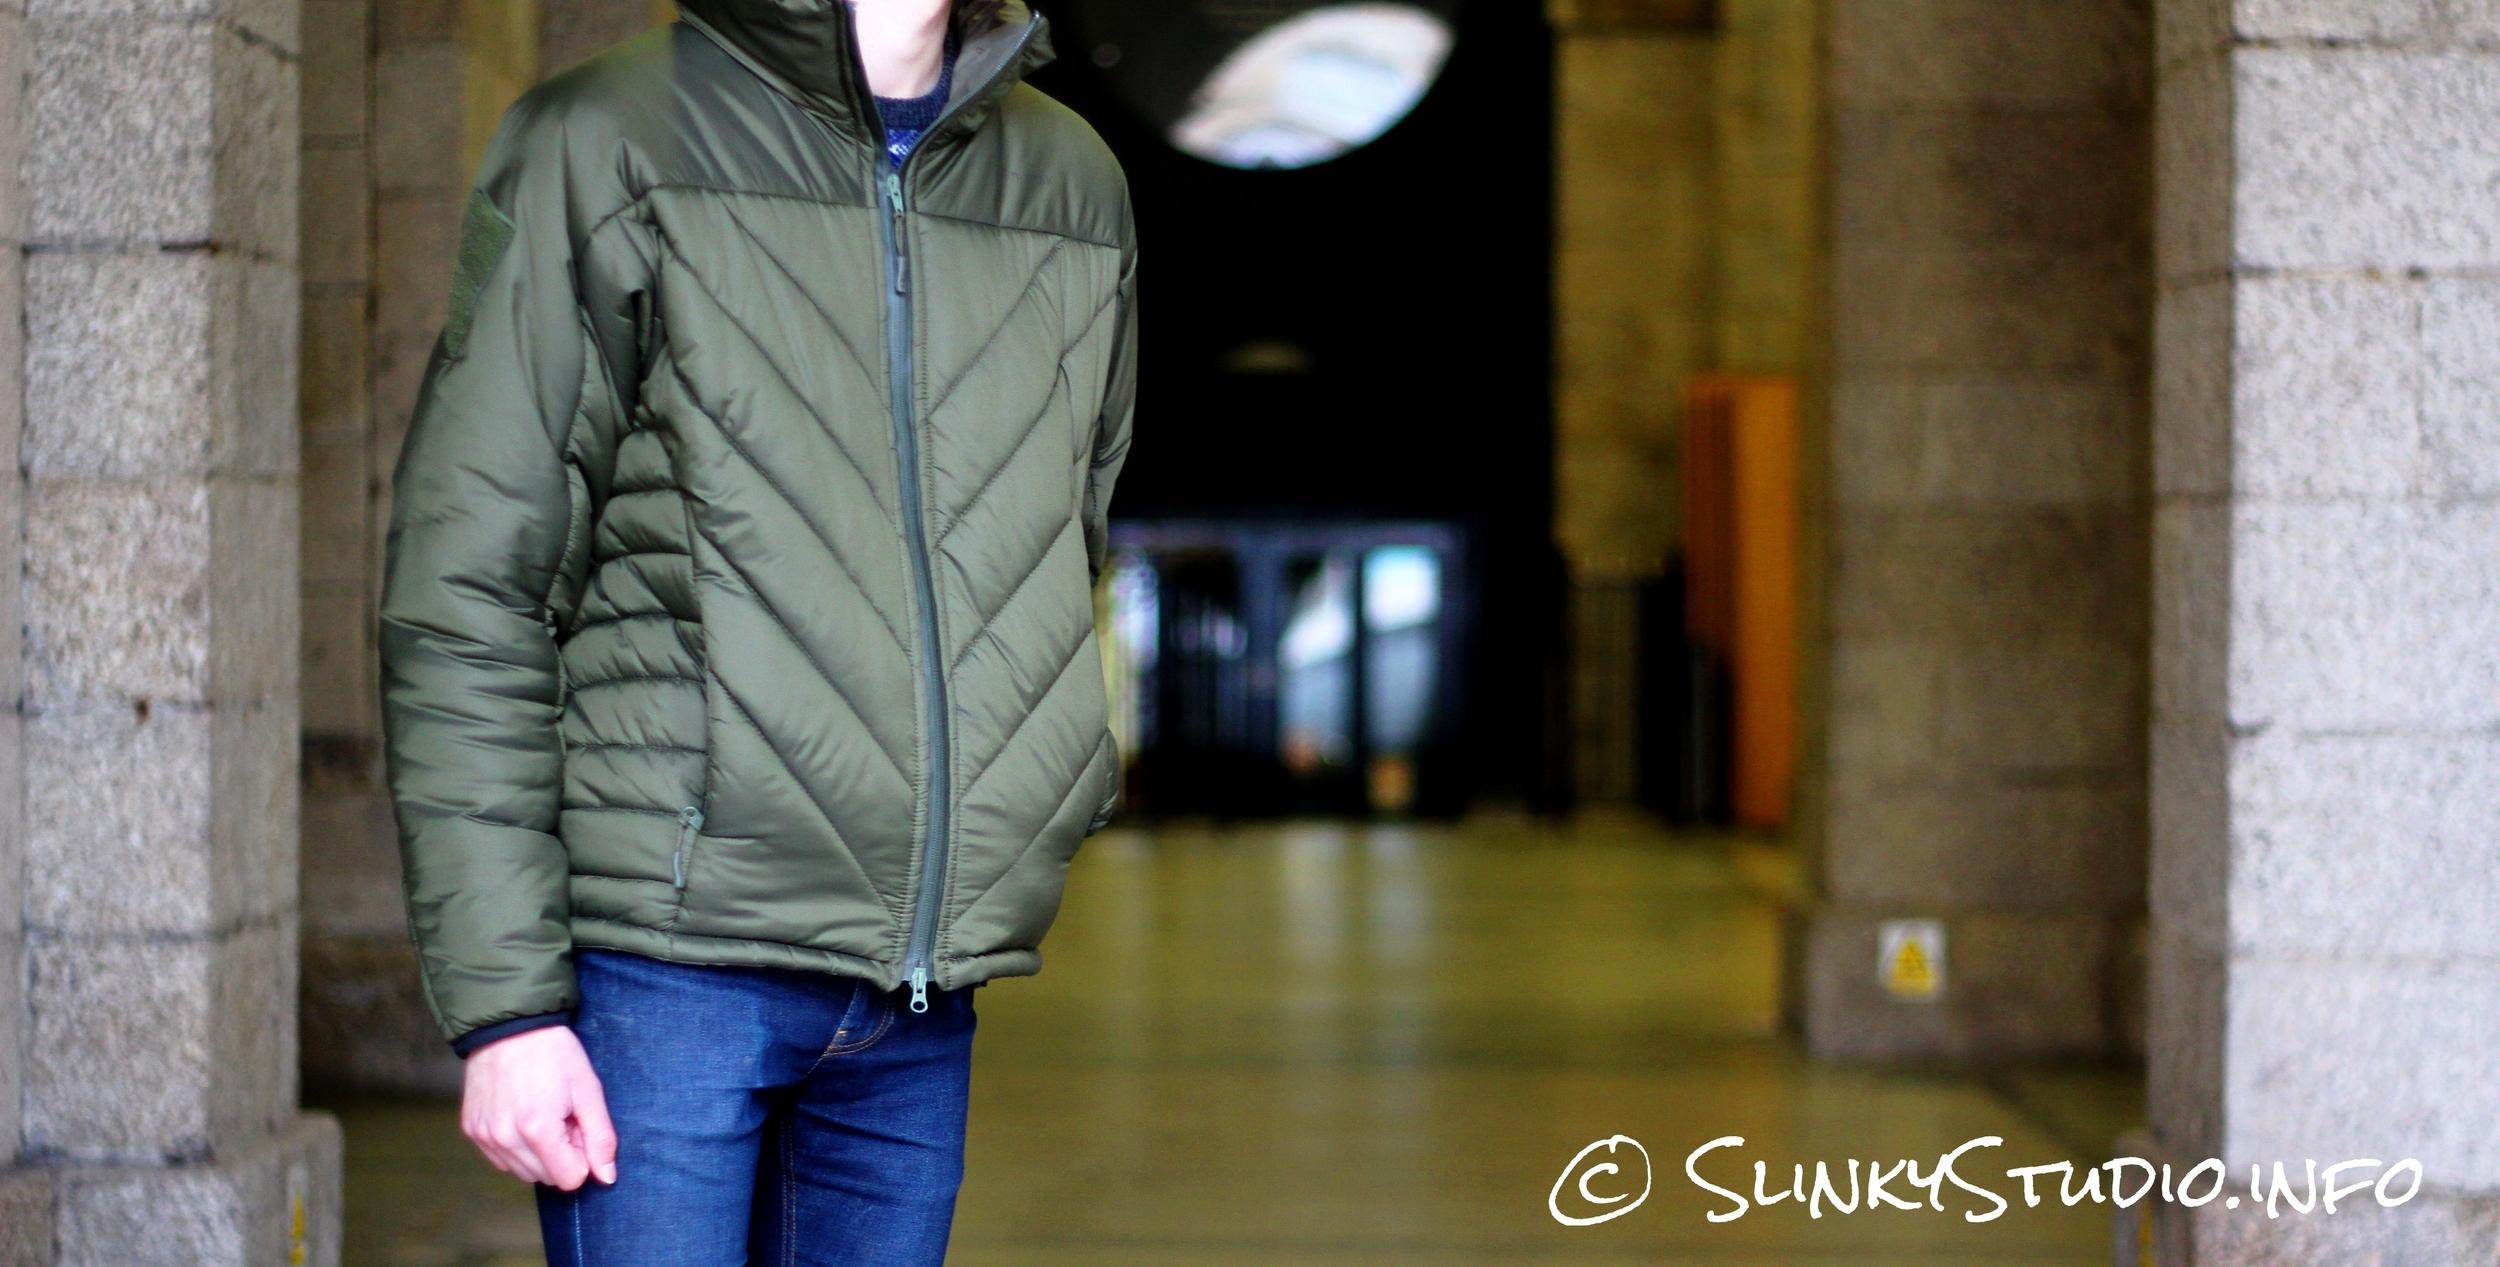 Snugpak SJ6 Jacket Hand in Pocket Leaning Train Station